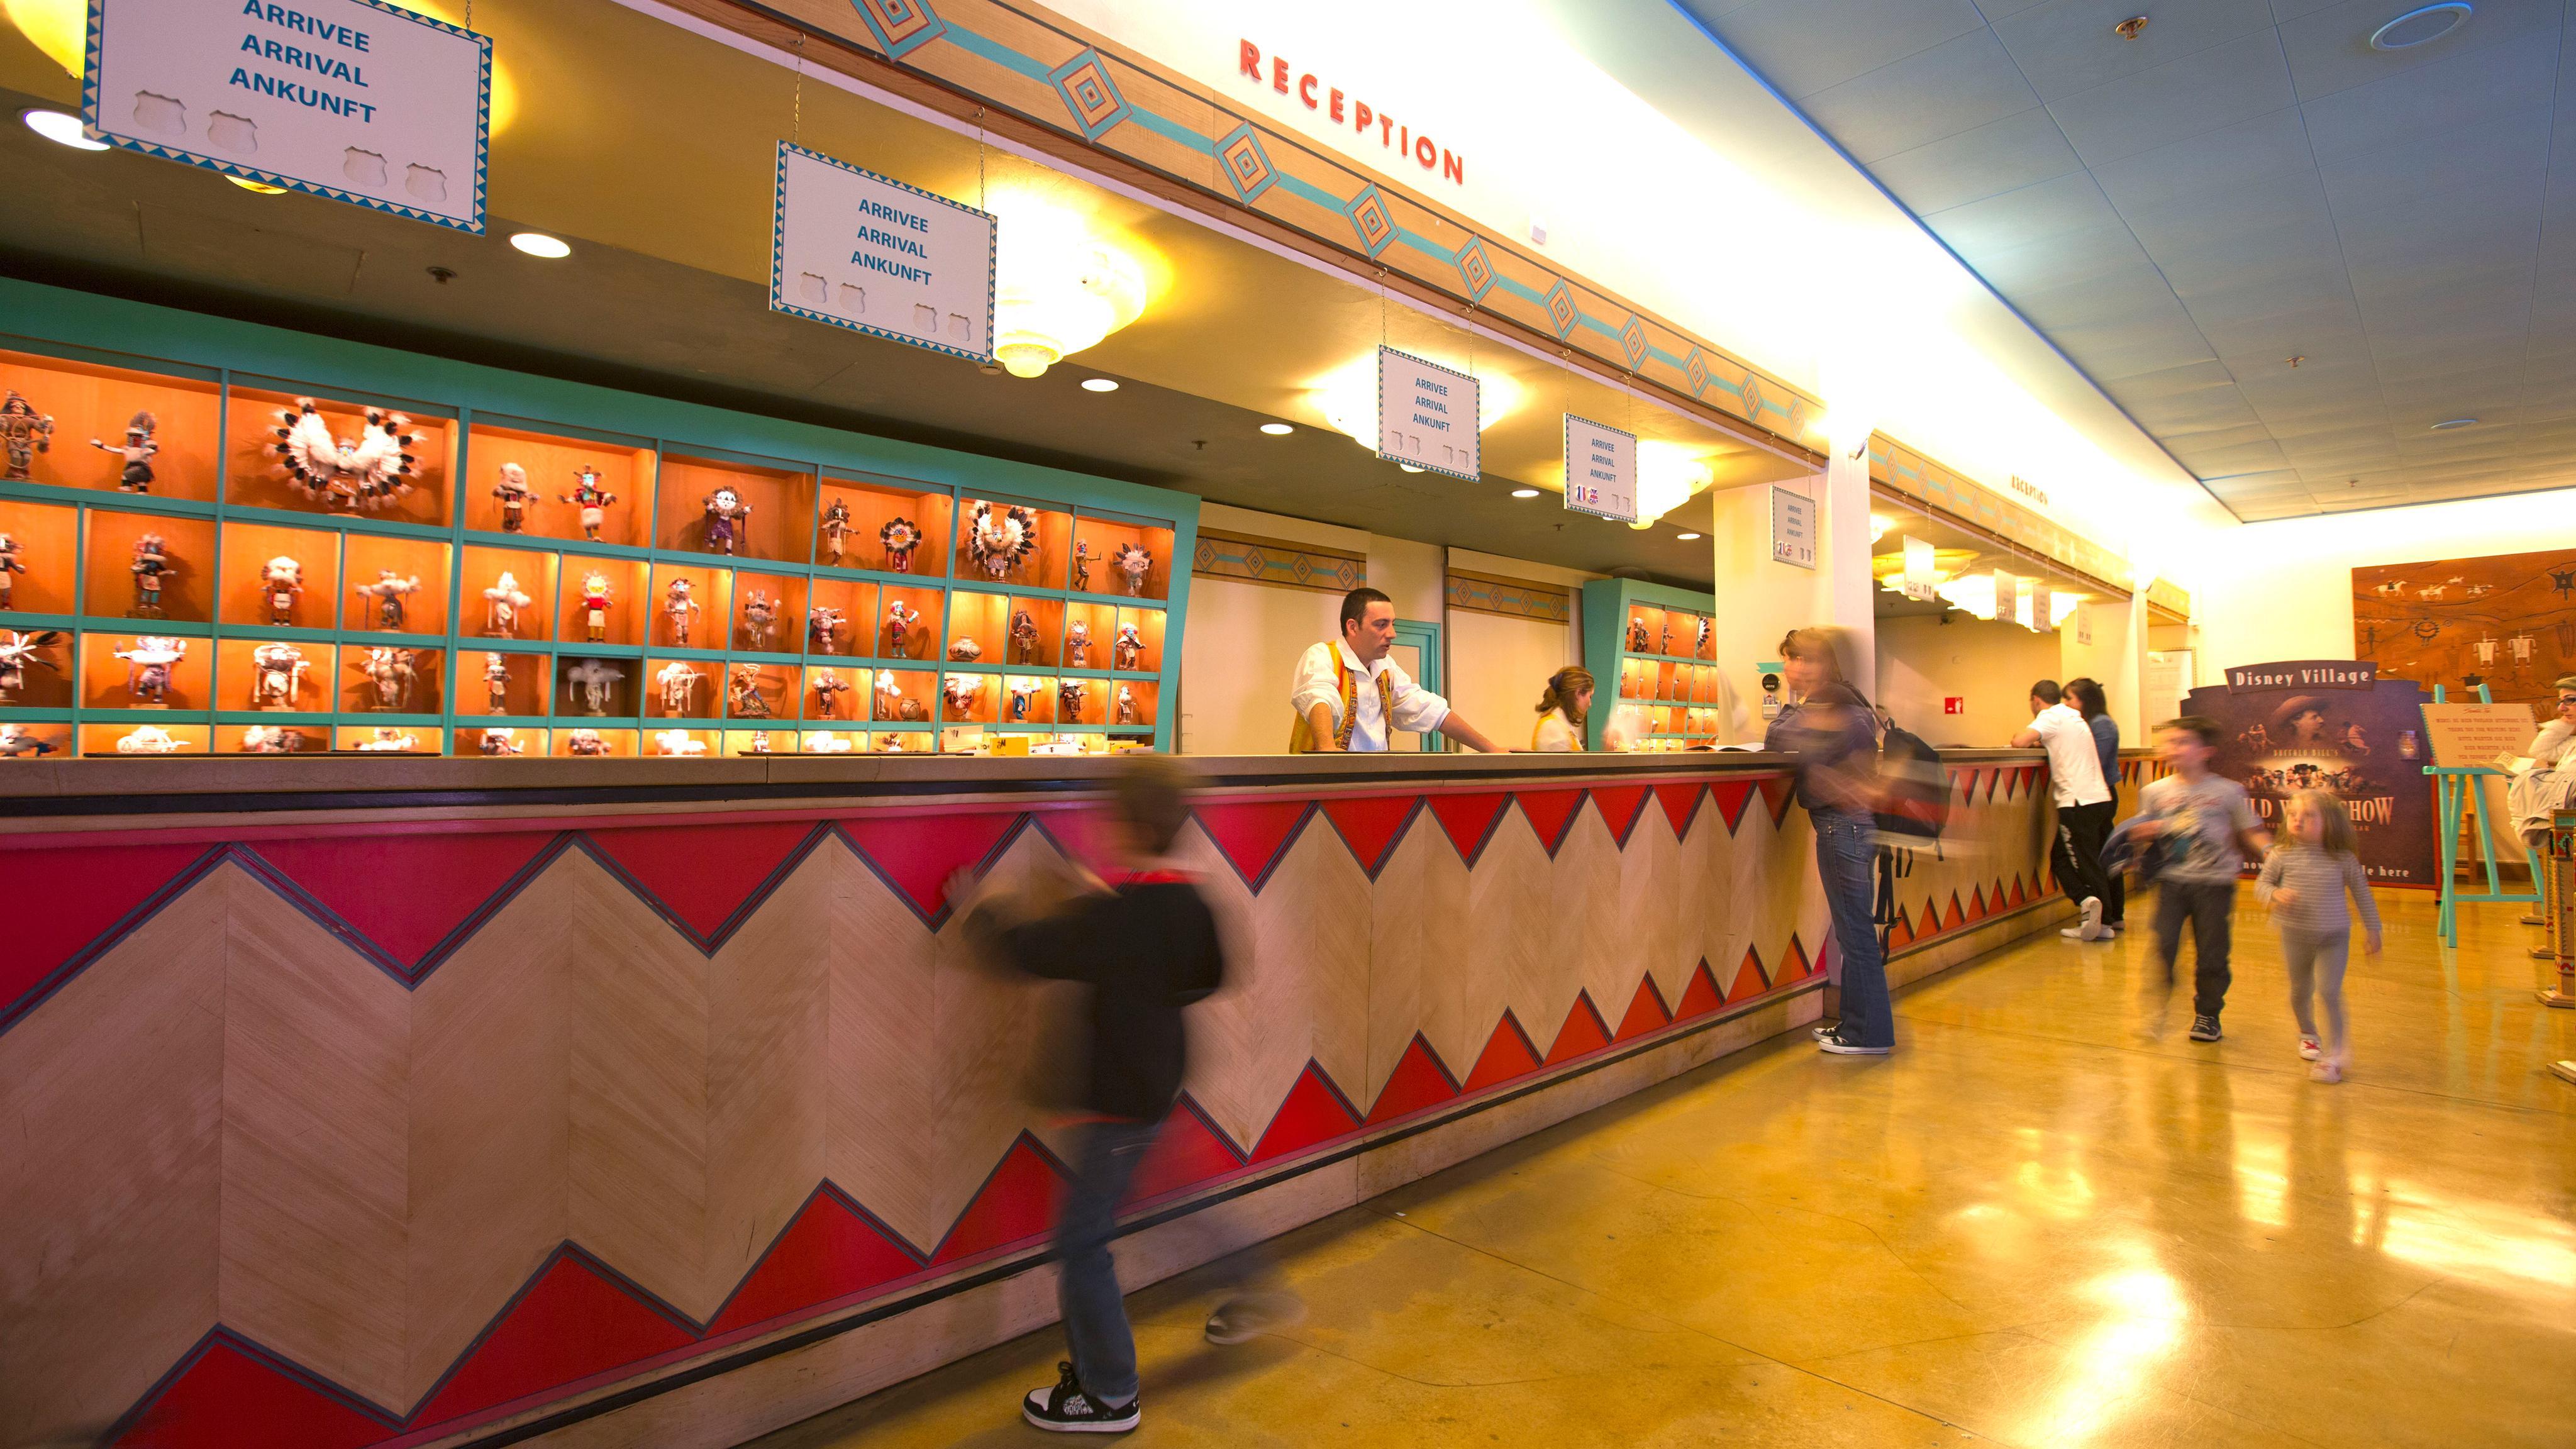 Camere Santa Fe Disneyland : Disney s hotel santa fe disneyland paris